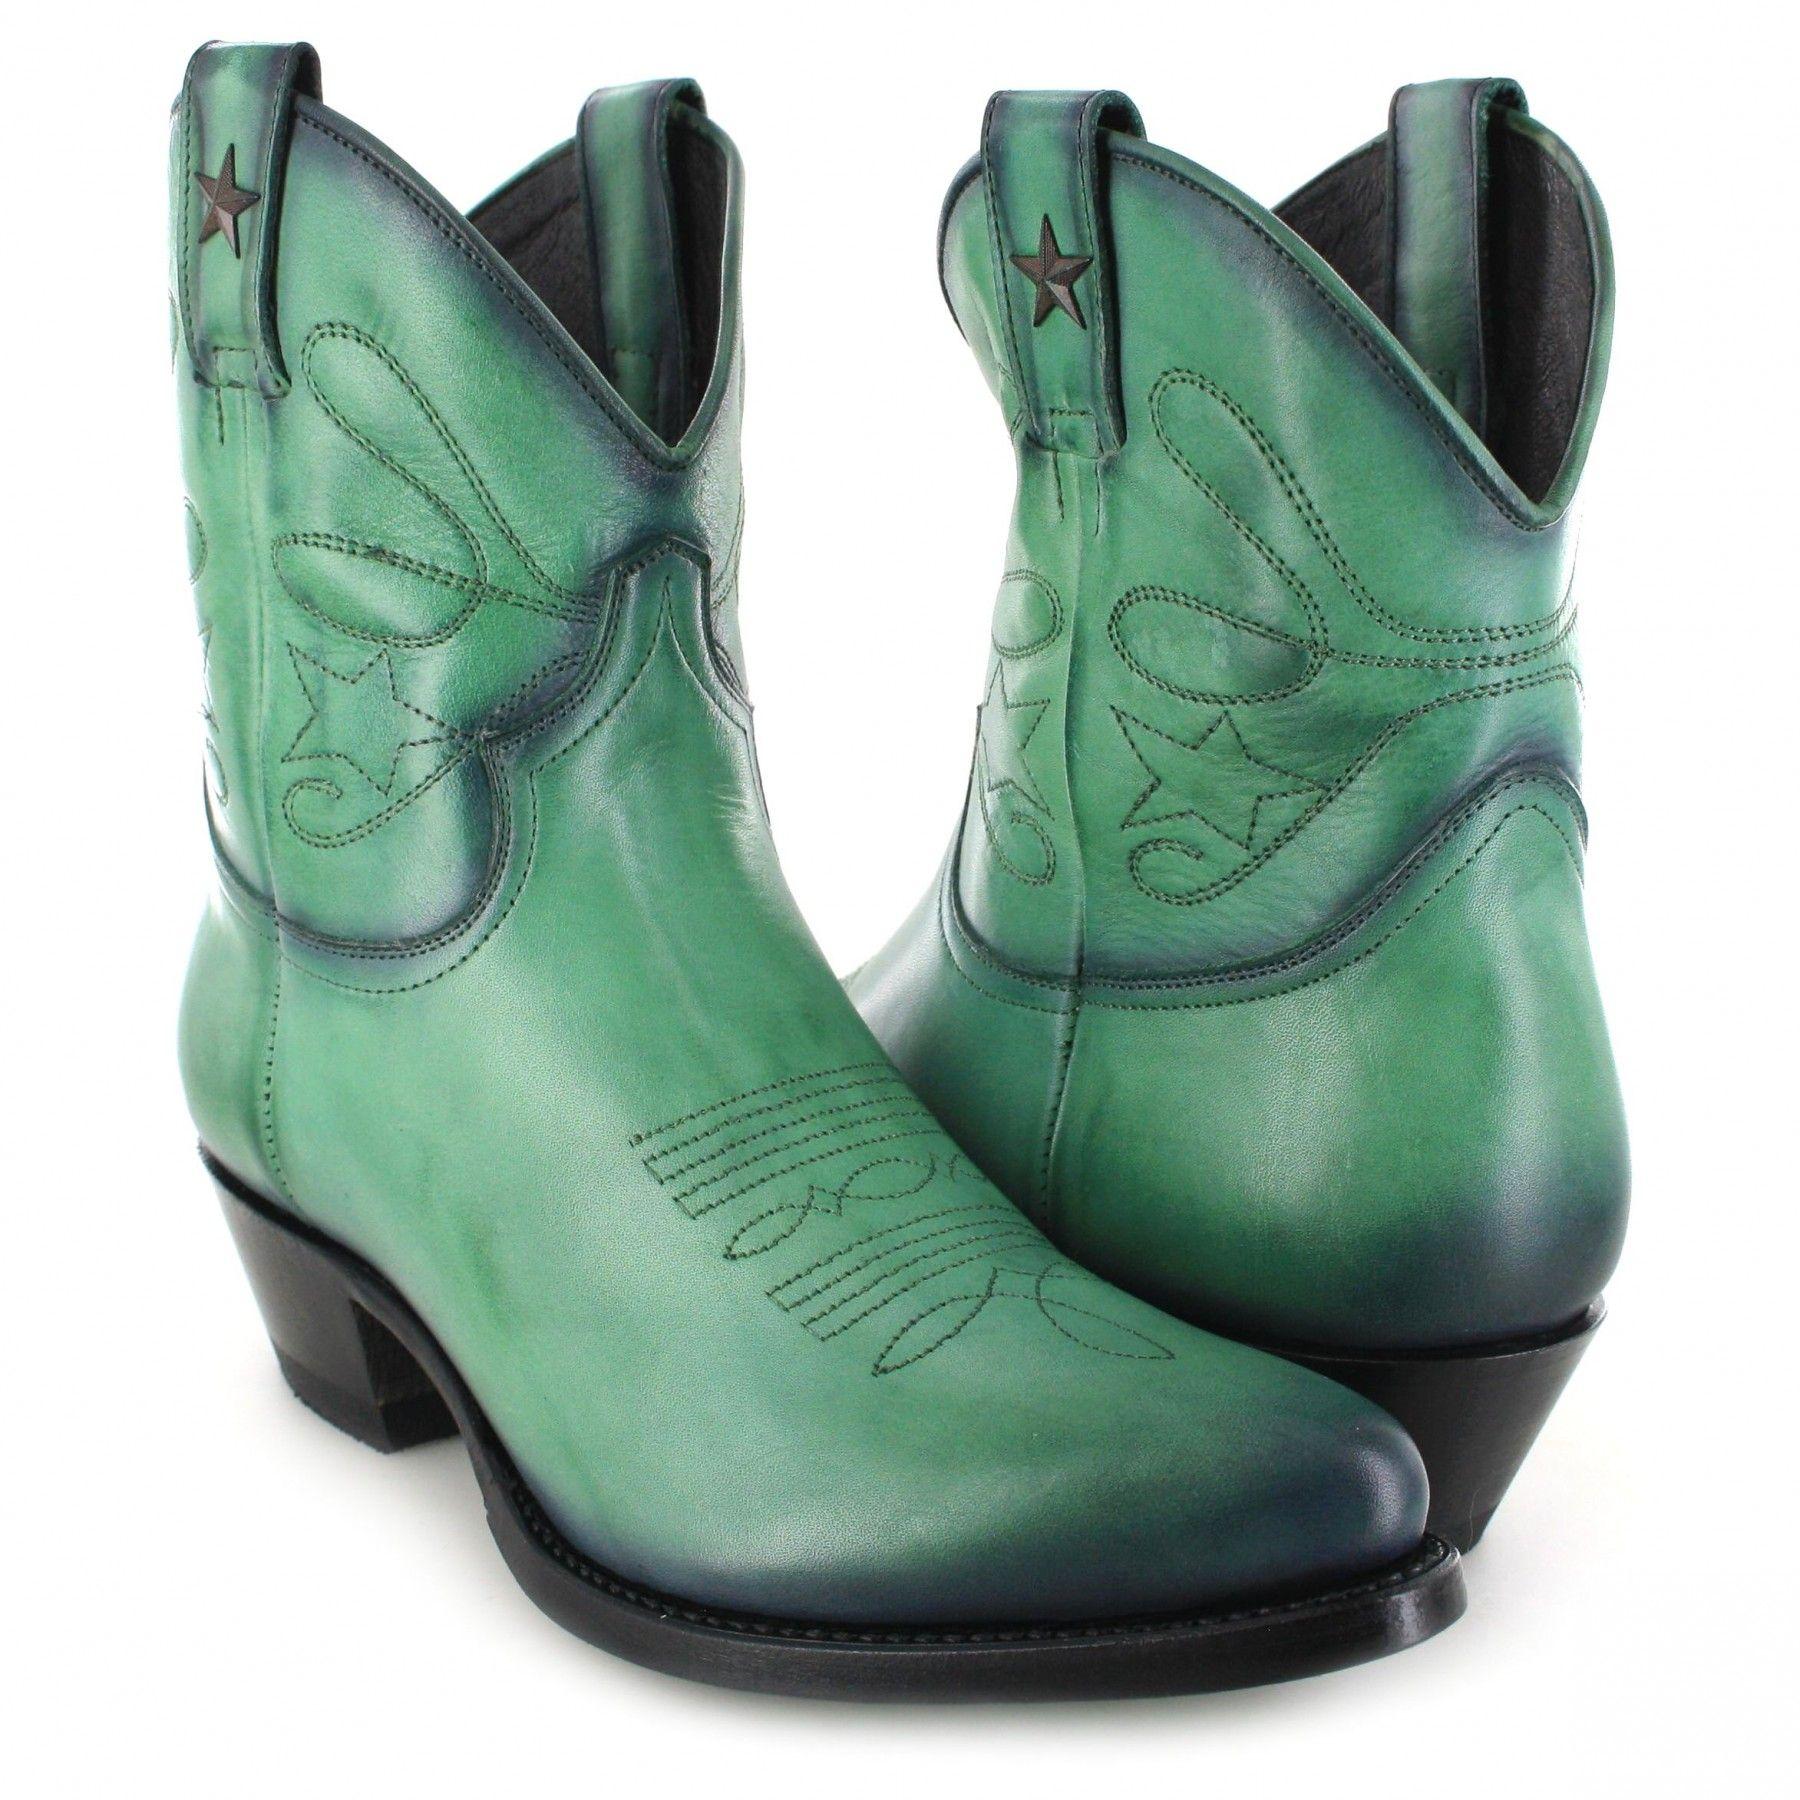 Mayura Verde Fashion 2374 Stiefelette Grün Boots c4LqSj35RA